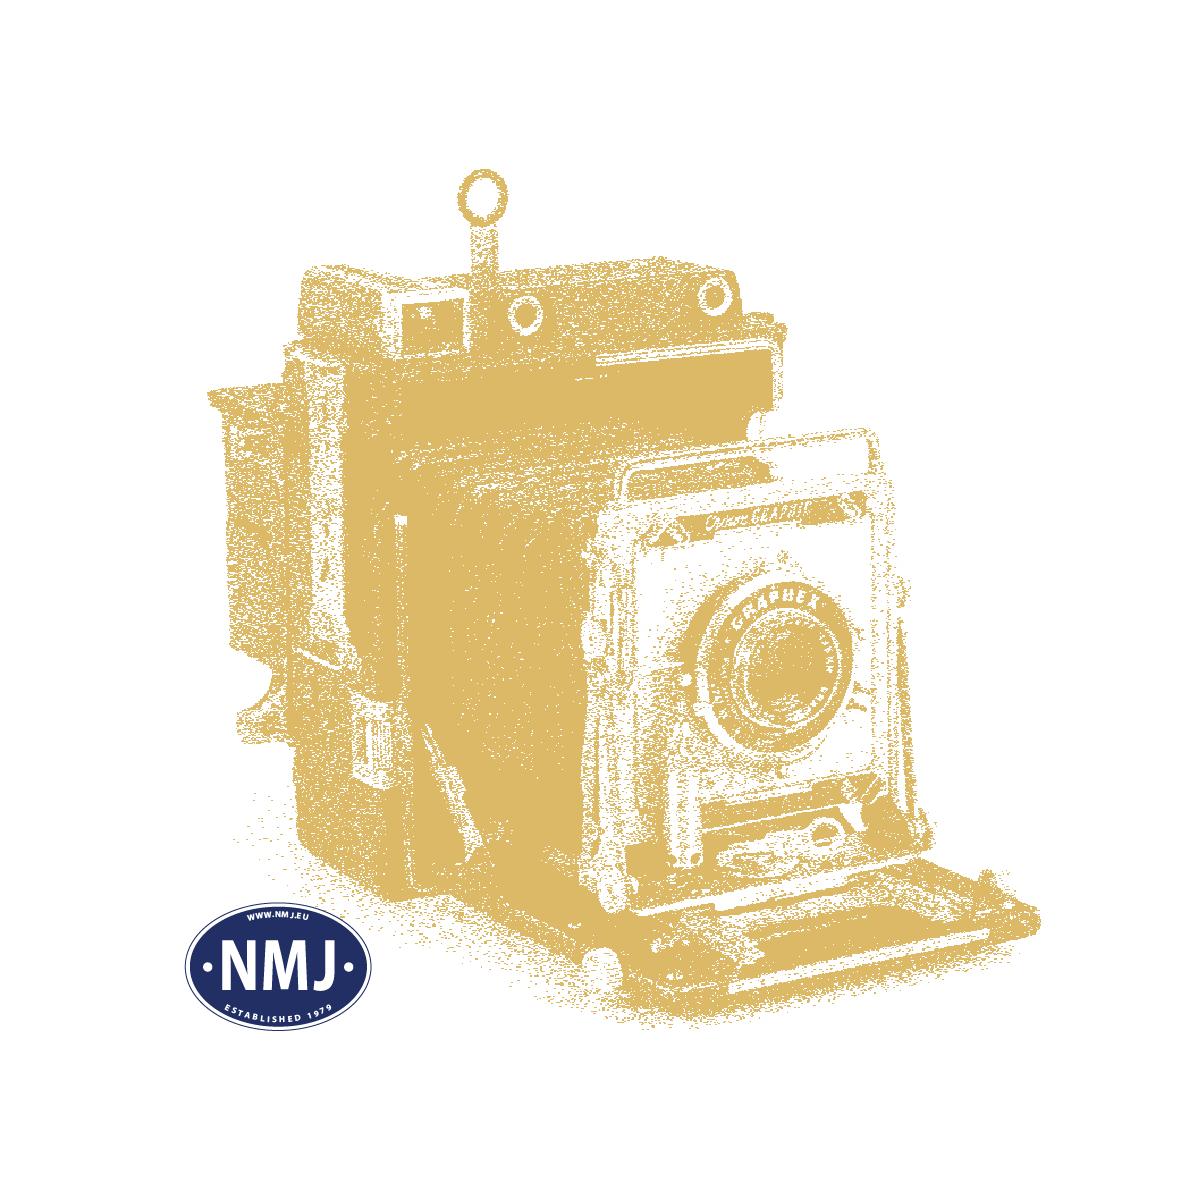 NMJT401.102 - NMJ Topline MAV Apmz 10-91 101-4, 1. Cl. Open